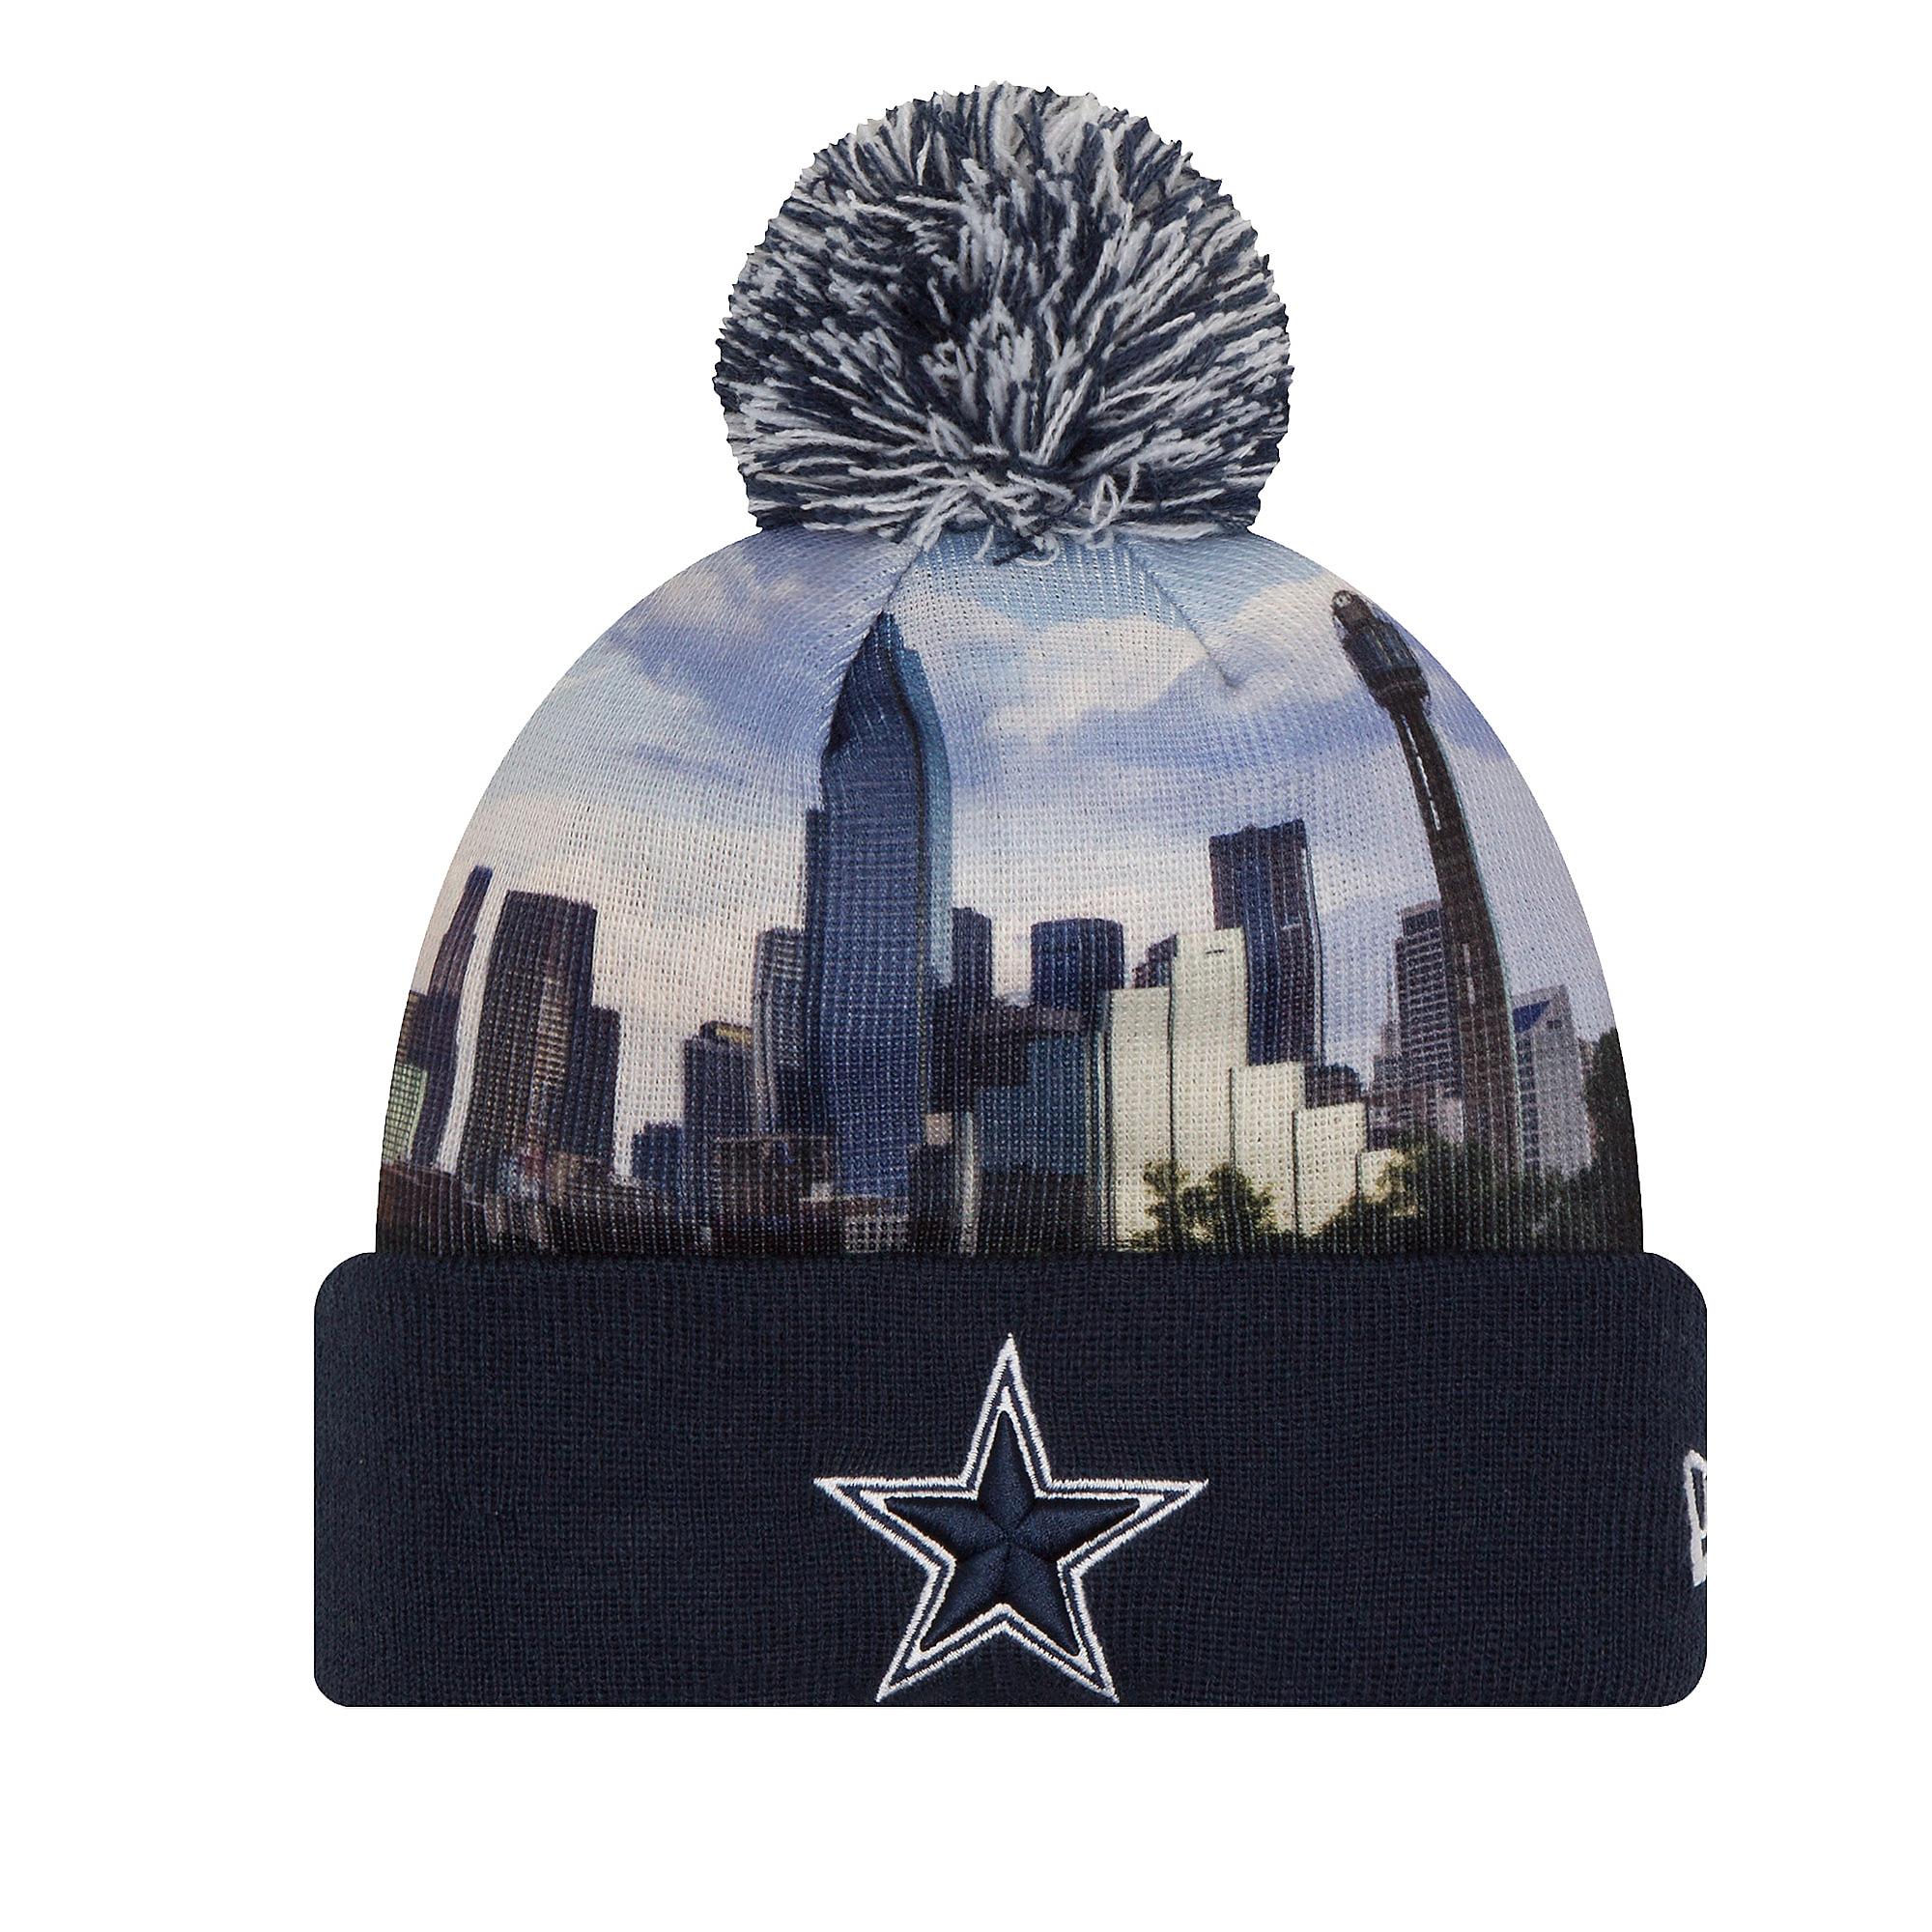 7bd68ed63 Dallas Cowboys New Era All Out Knit Hat | Dallas Cowboys Pro Shop